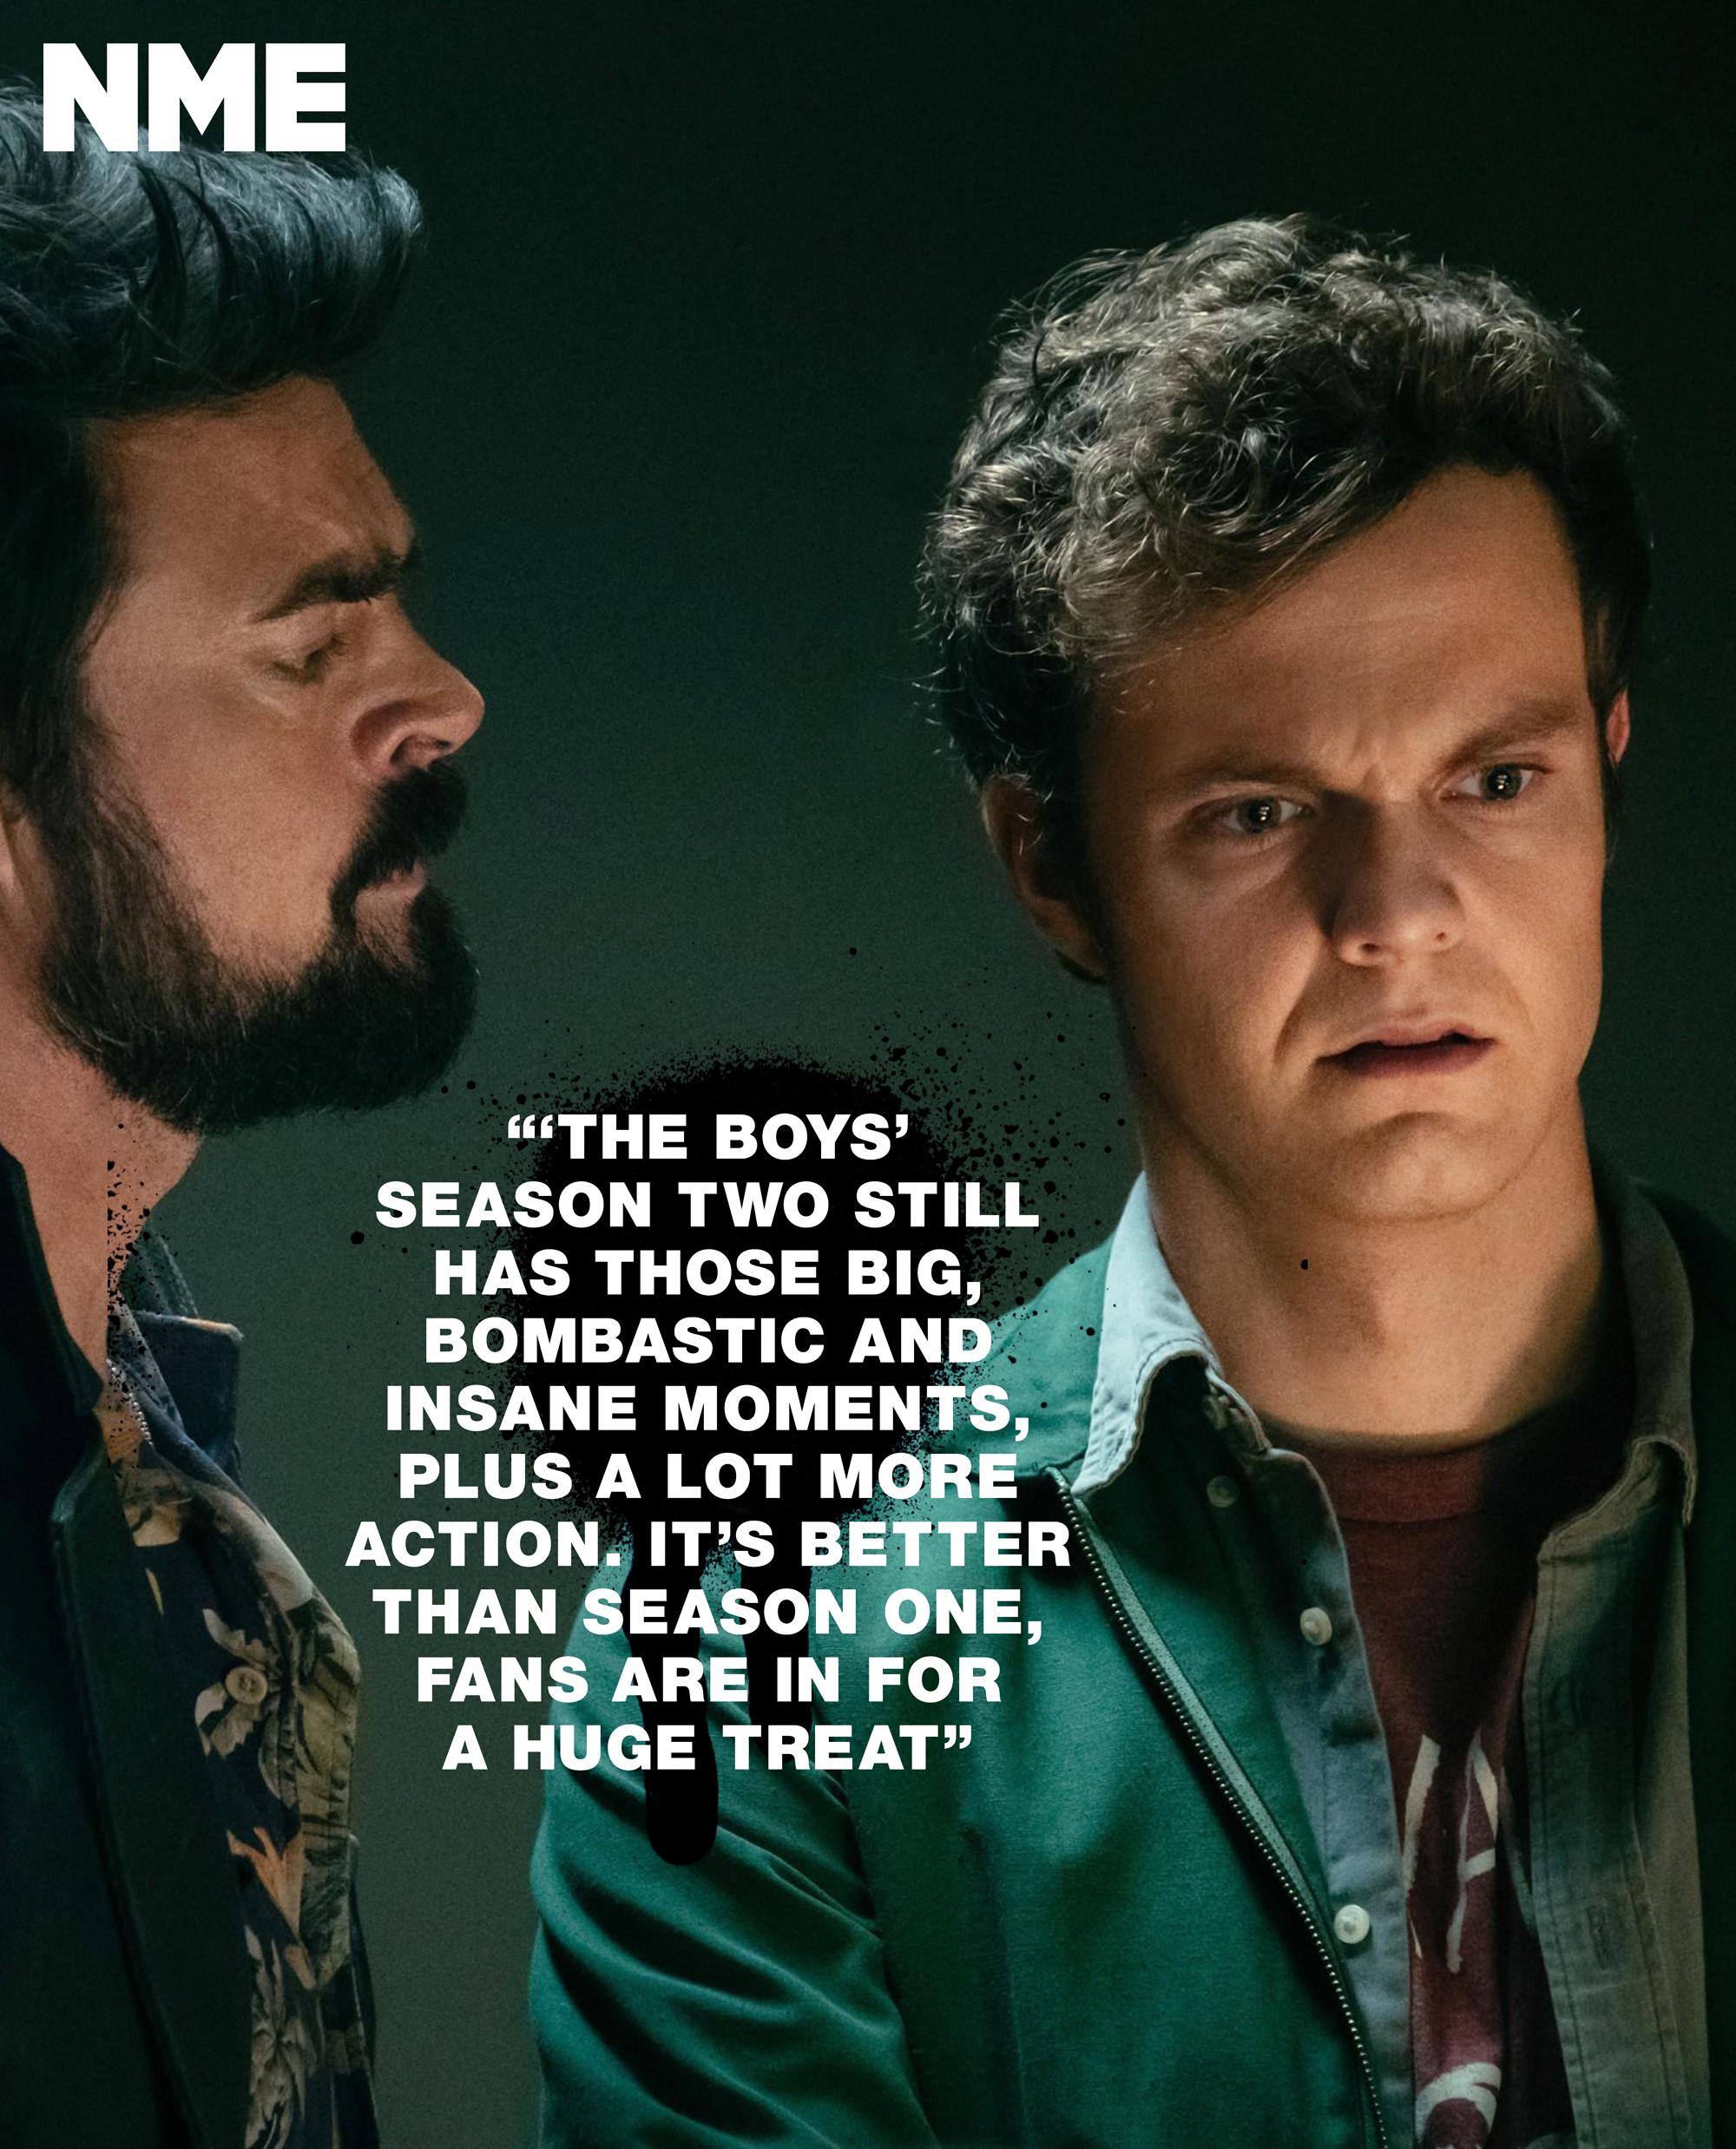 Jack Quaid On The Boys Season 2 Quot It S Big Bombastic